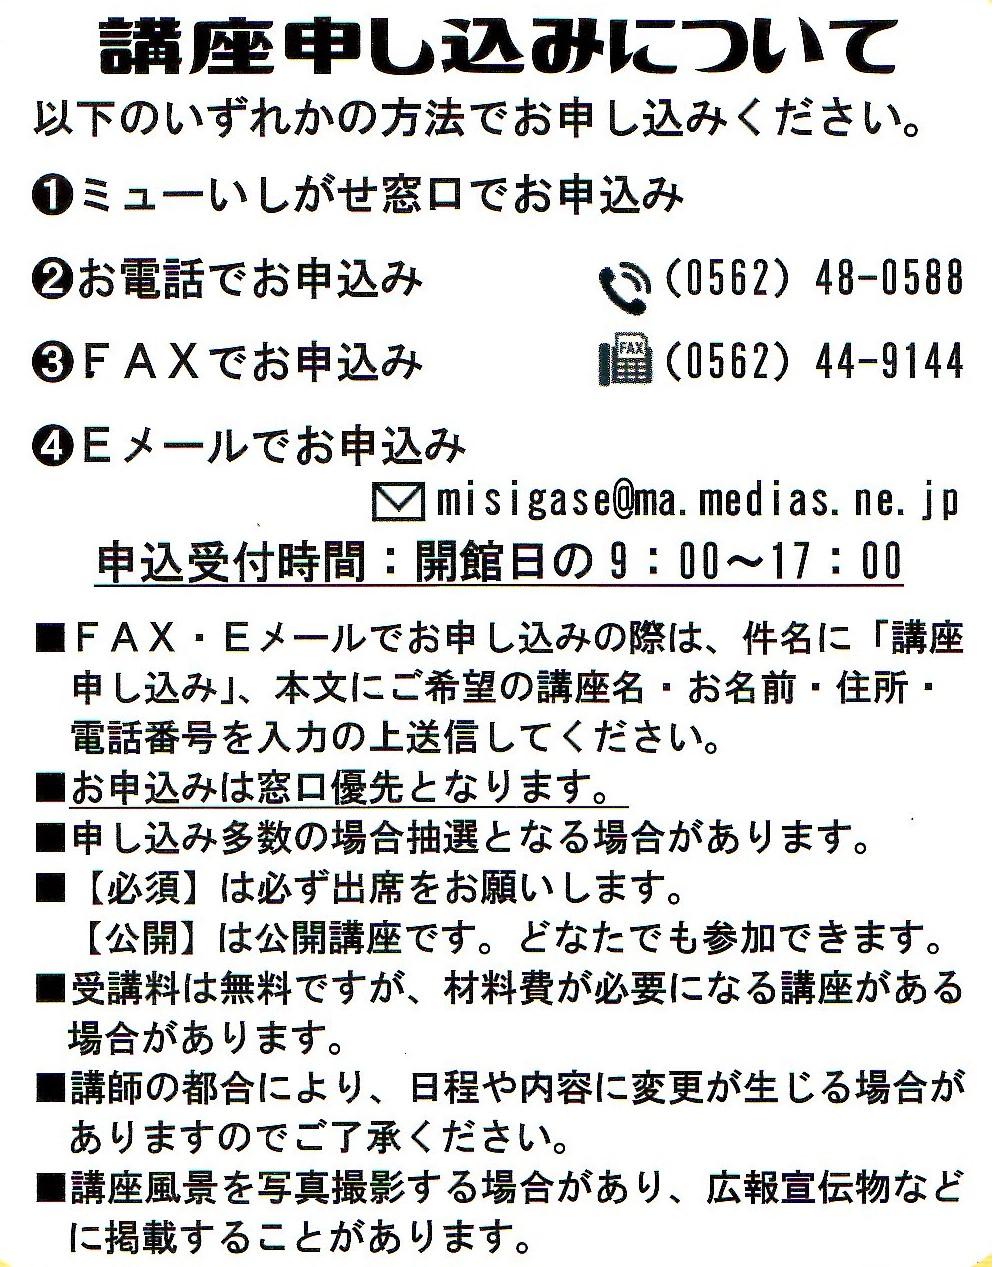 f:id:nagoyalgbt:20200405220153j:plain